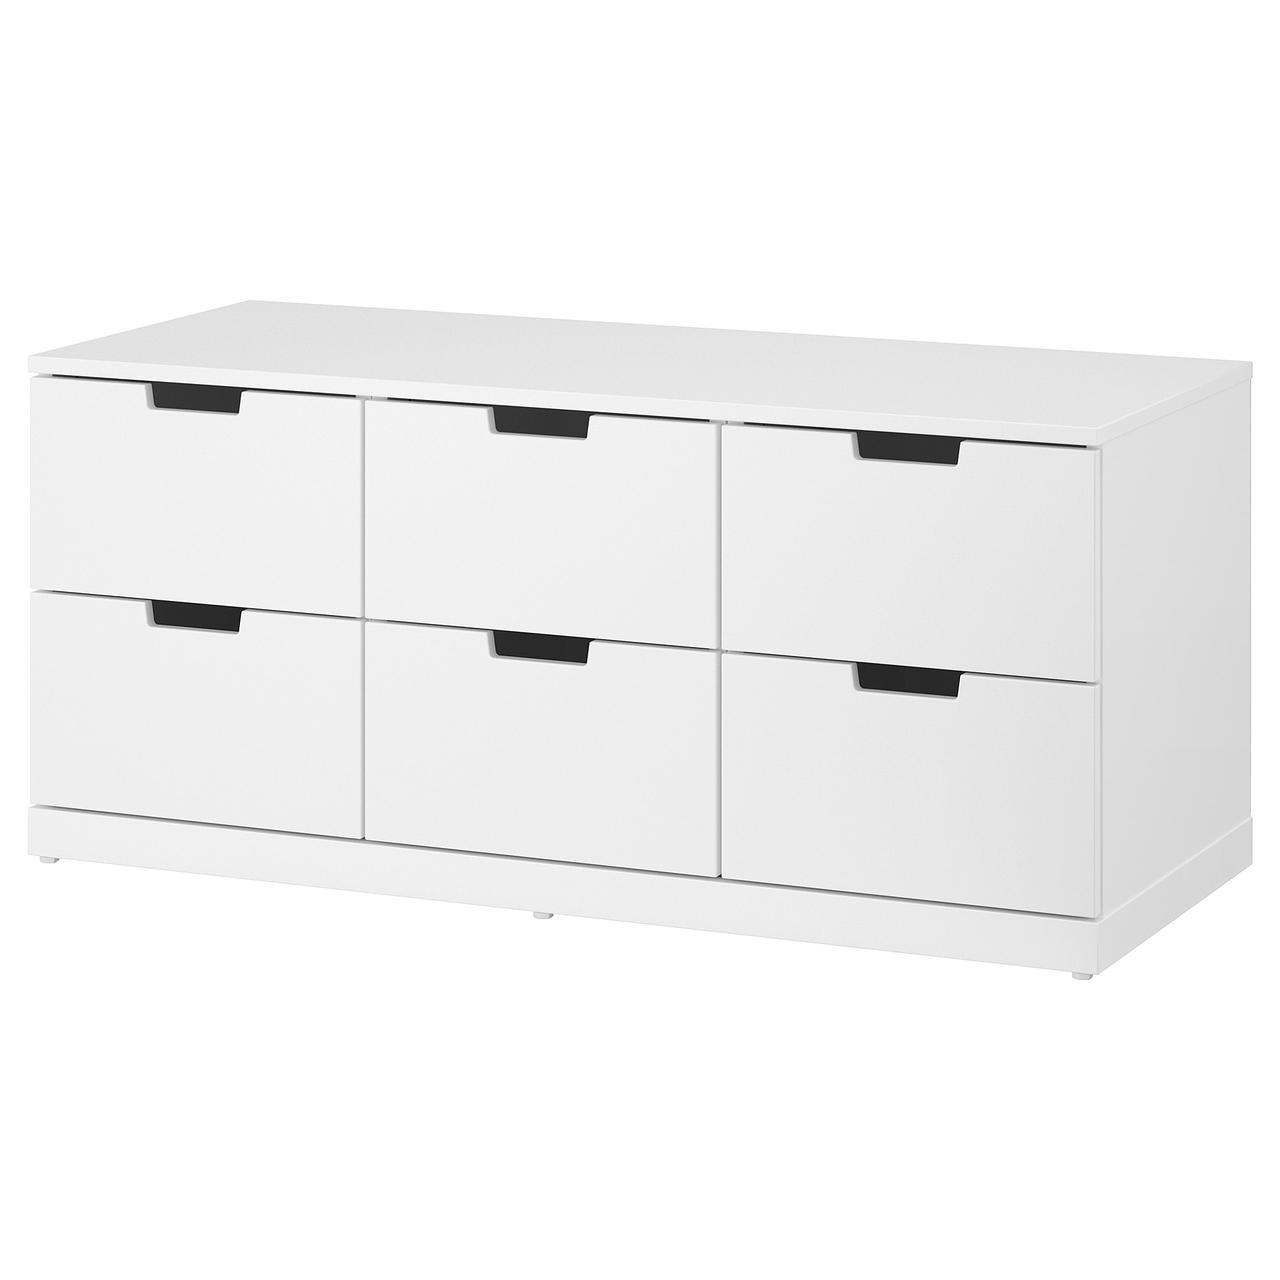 IKEA NORDLI (292.394.97) Комод, 6 ящиков